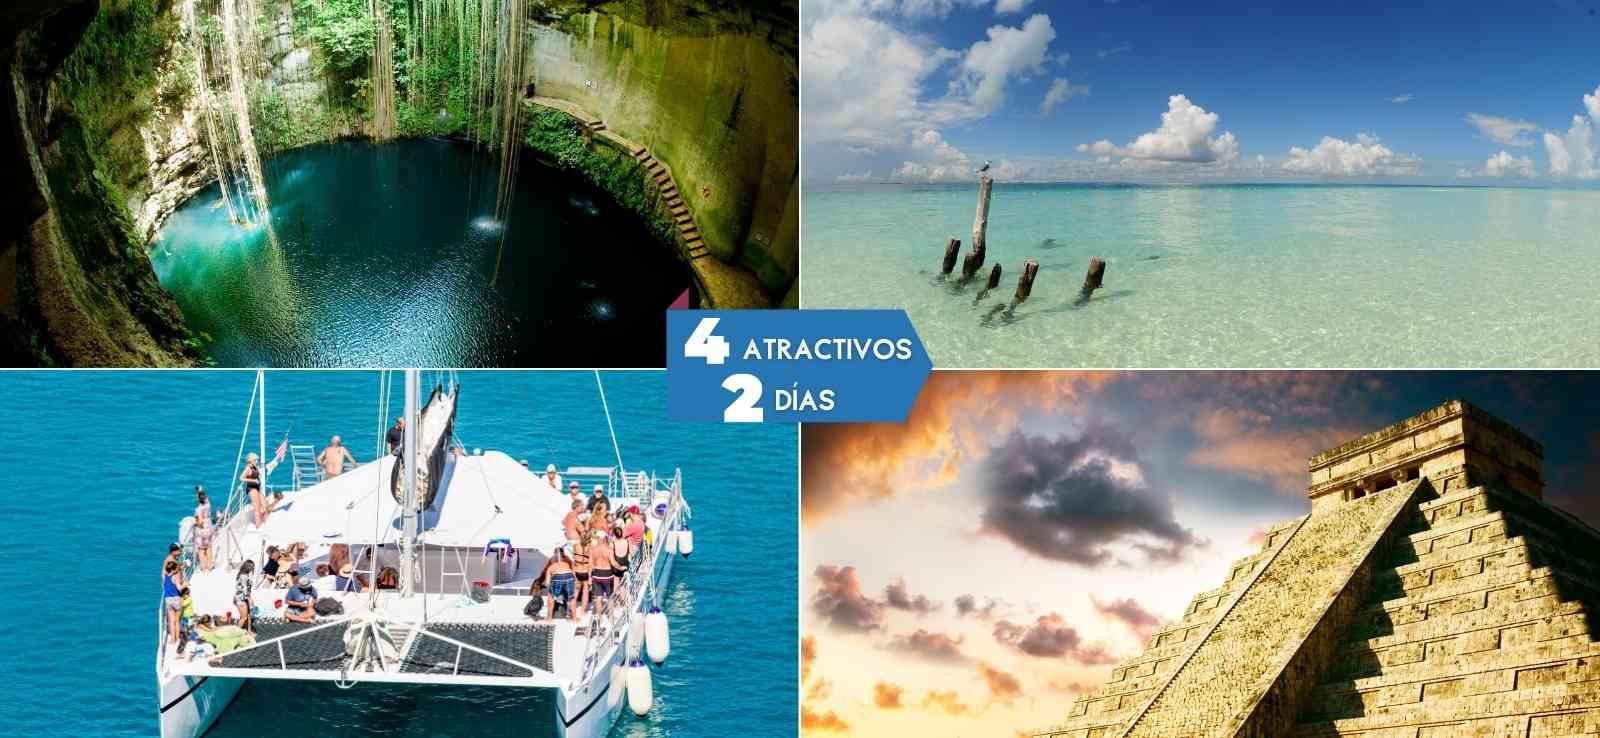 Combos Chichen Itzá tour + Isla Mujeres / 2 Días - 2 Tours